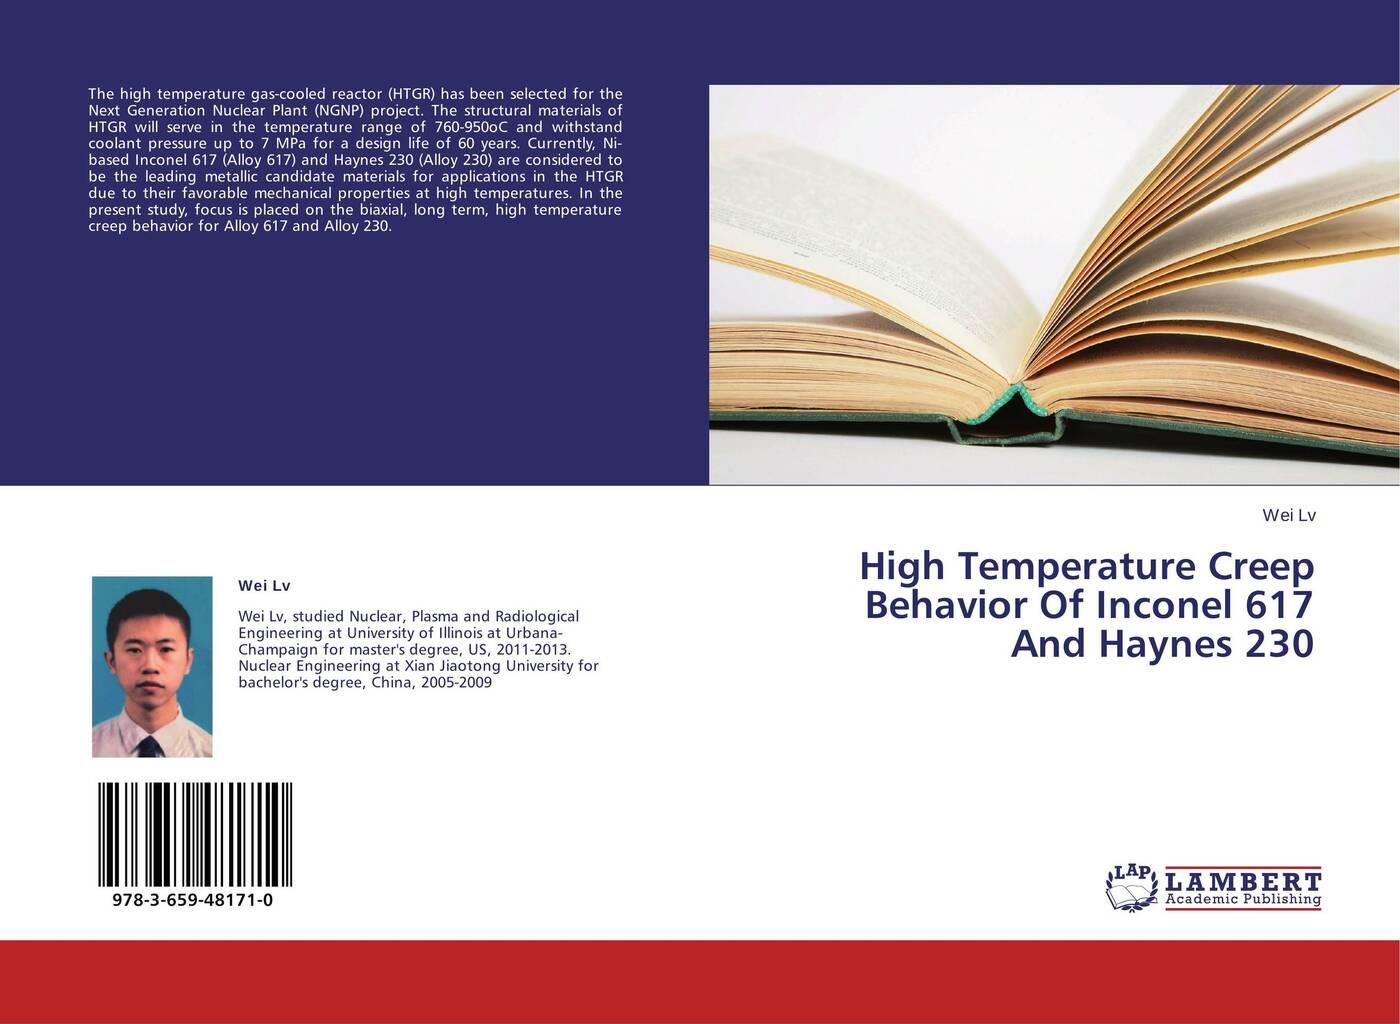 High Temperature Creep Behavior Of Inconel 617 And Haynes 230